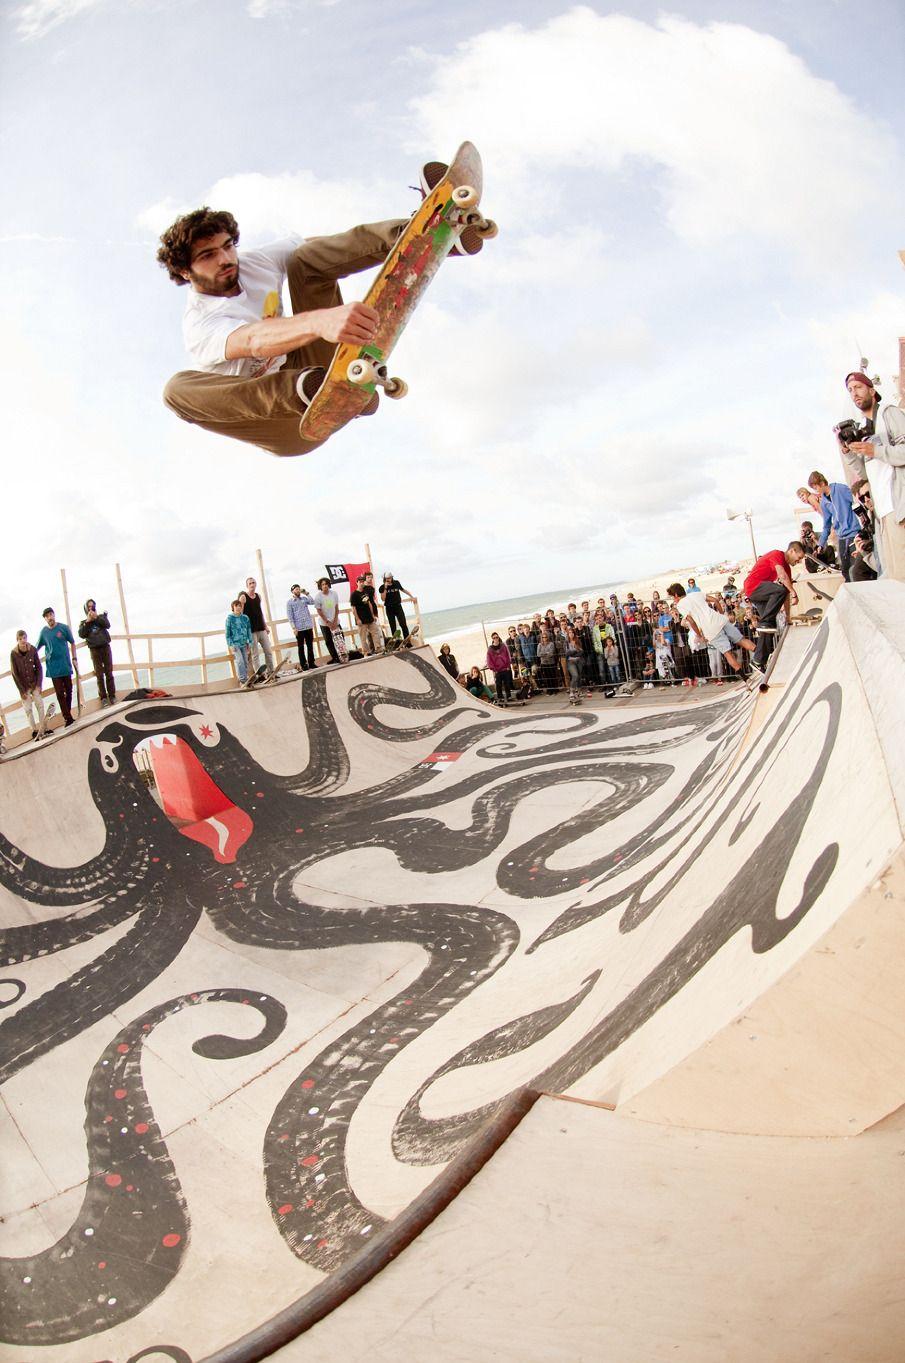 http://colortwister.de #autocad #construction #industrialdesign #skatepark #skateboard #designplaning #hossegor #goodtimes